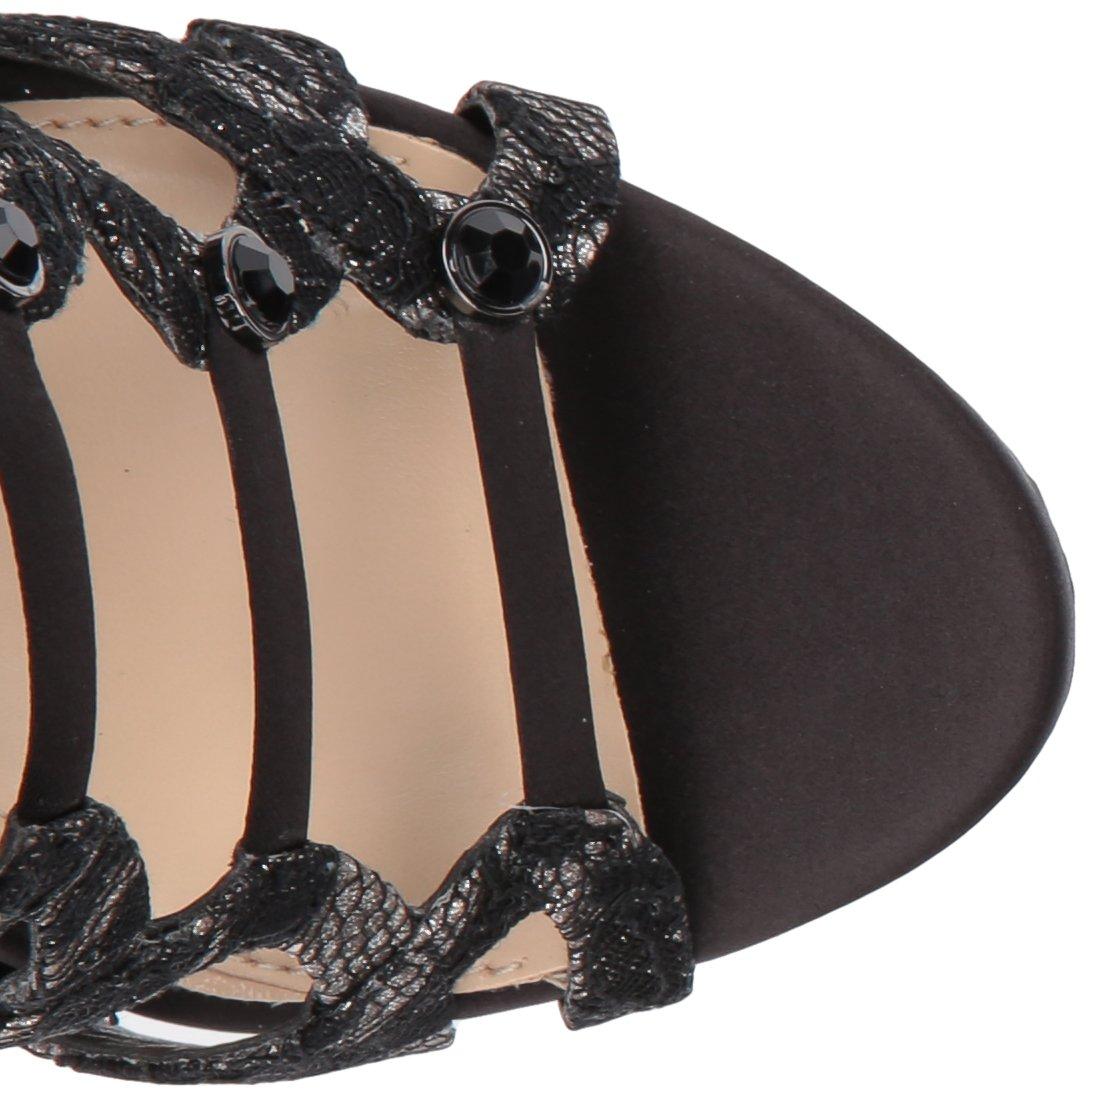 Imagine Vince Camuto Donna  DALANY Heeled Heeled Heeled Sandal - Choose SZ colore 66356d